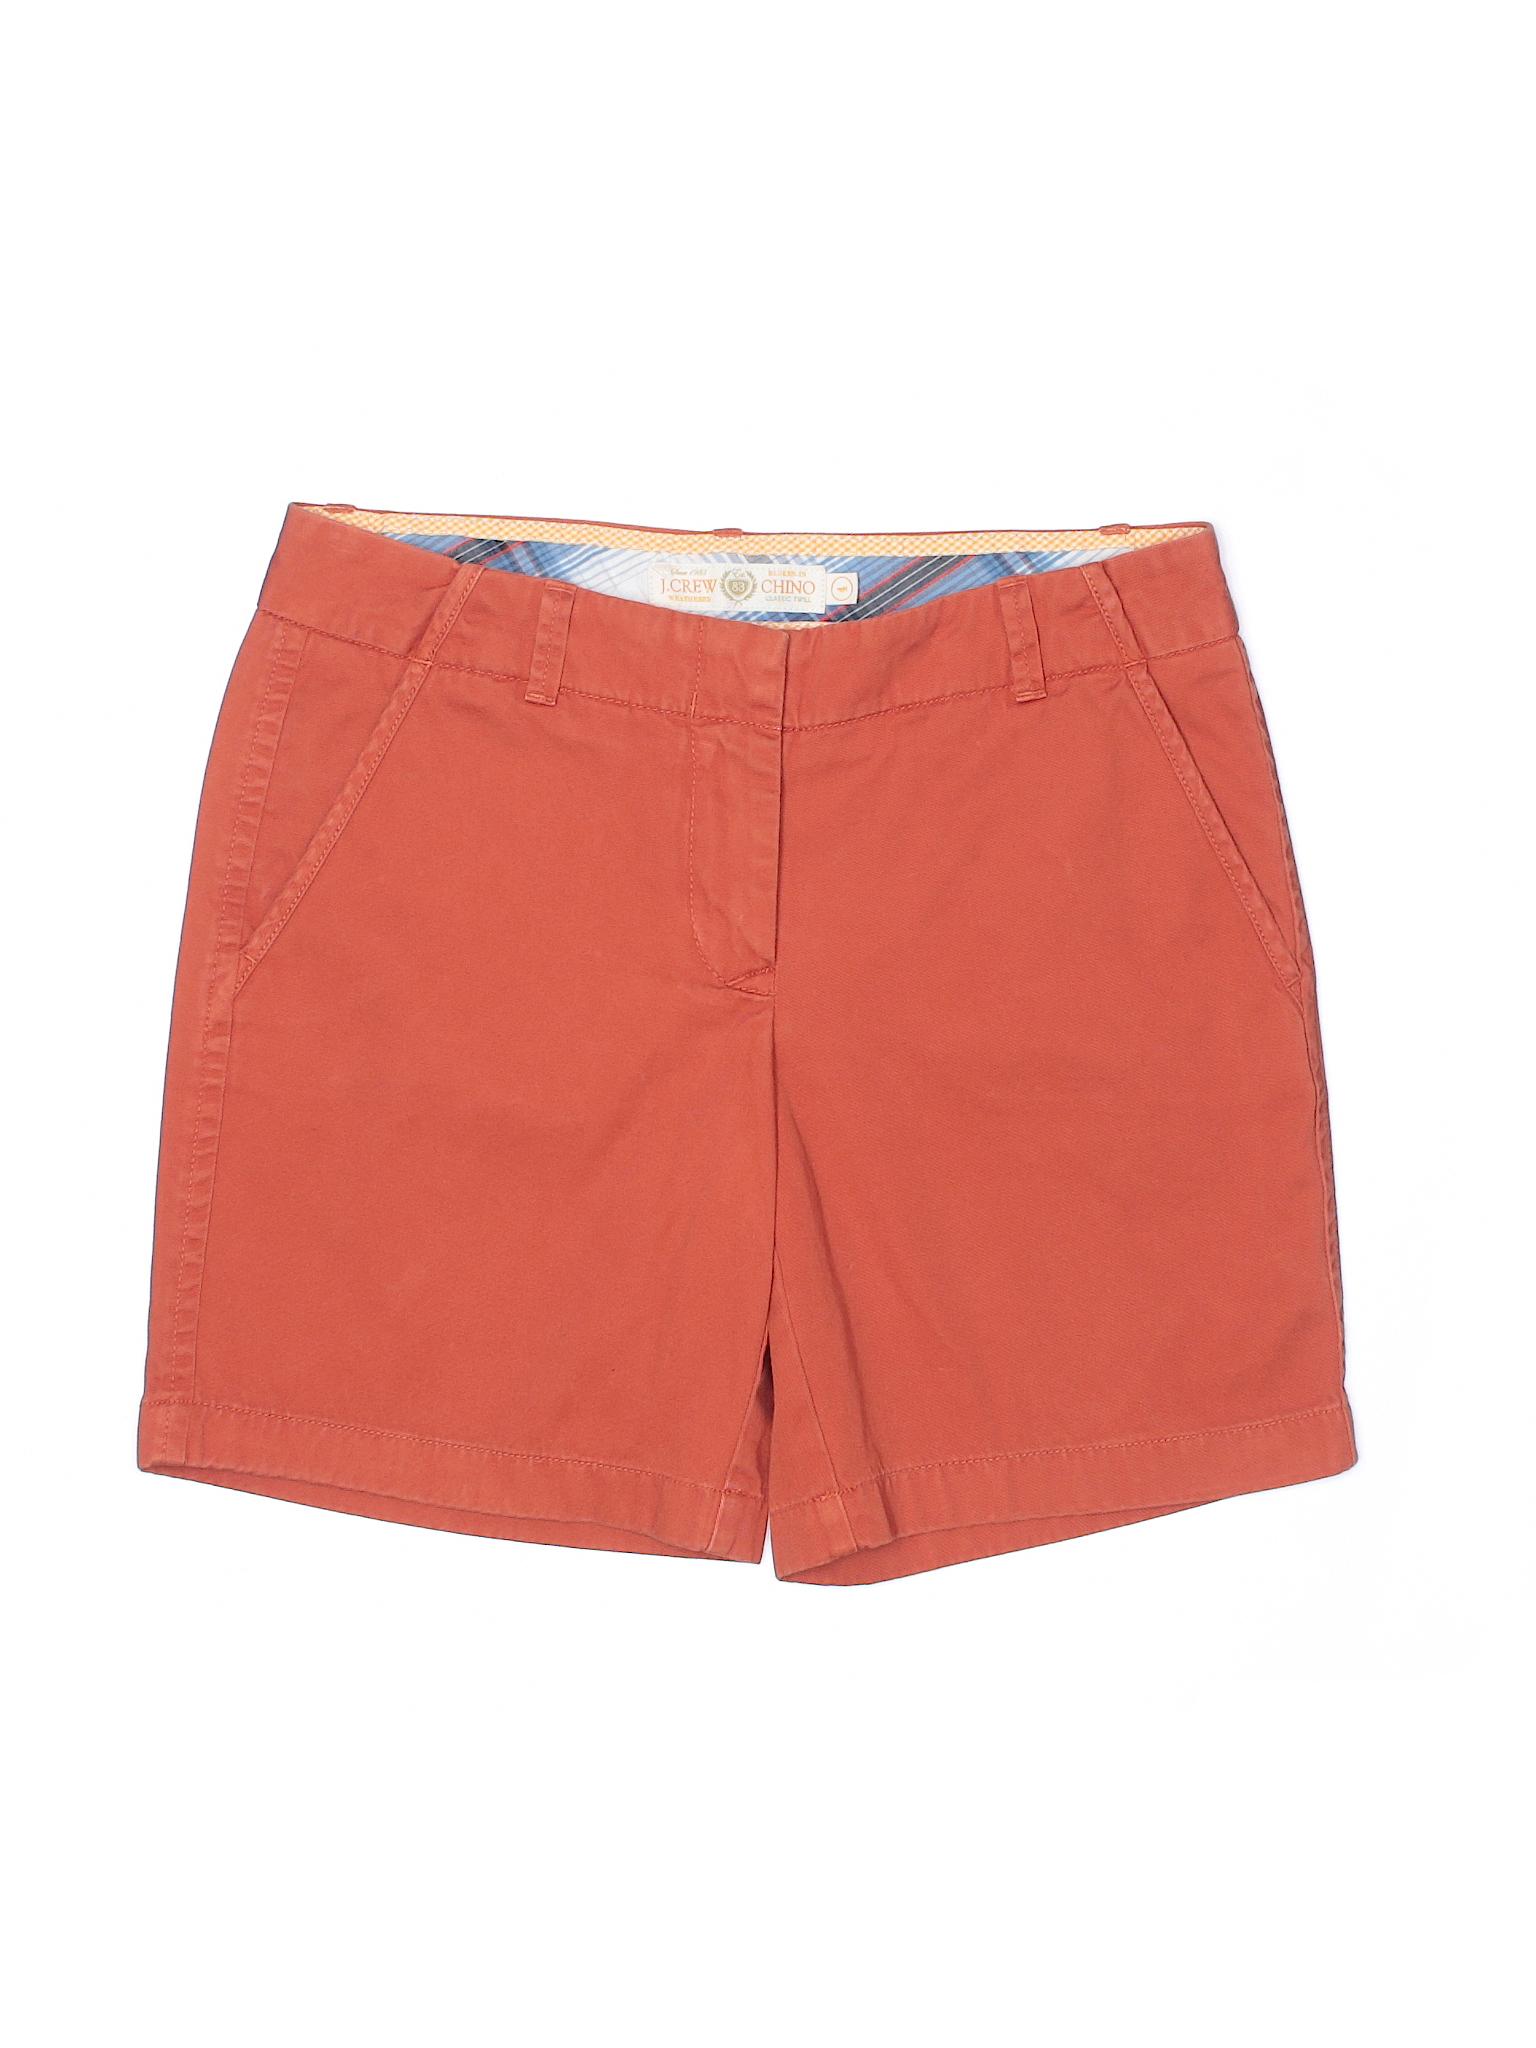 Boutique winter Khaki J Crew Shorts HBHg1qfx